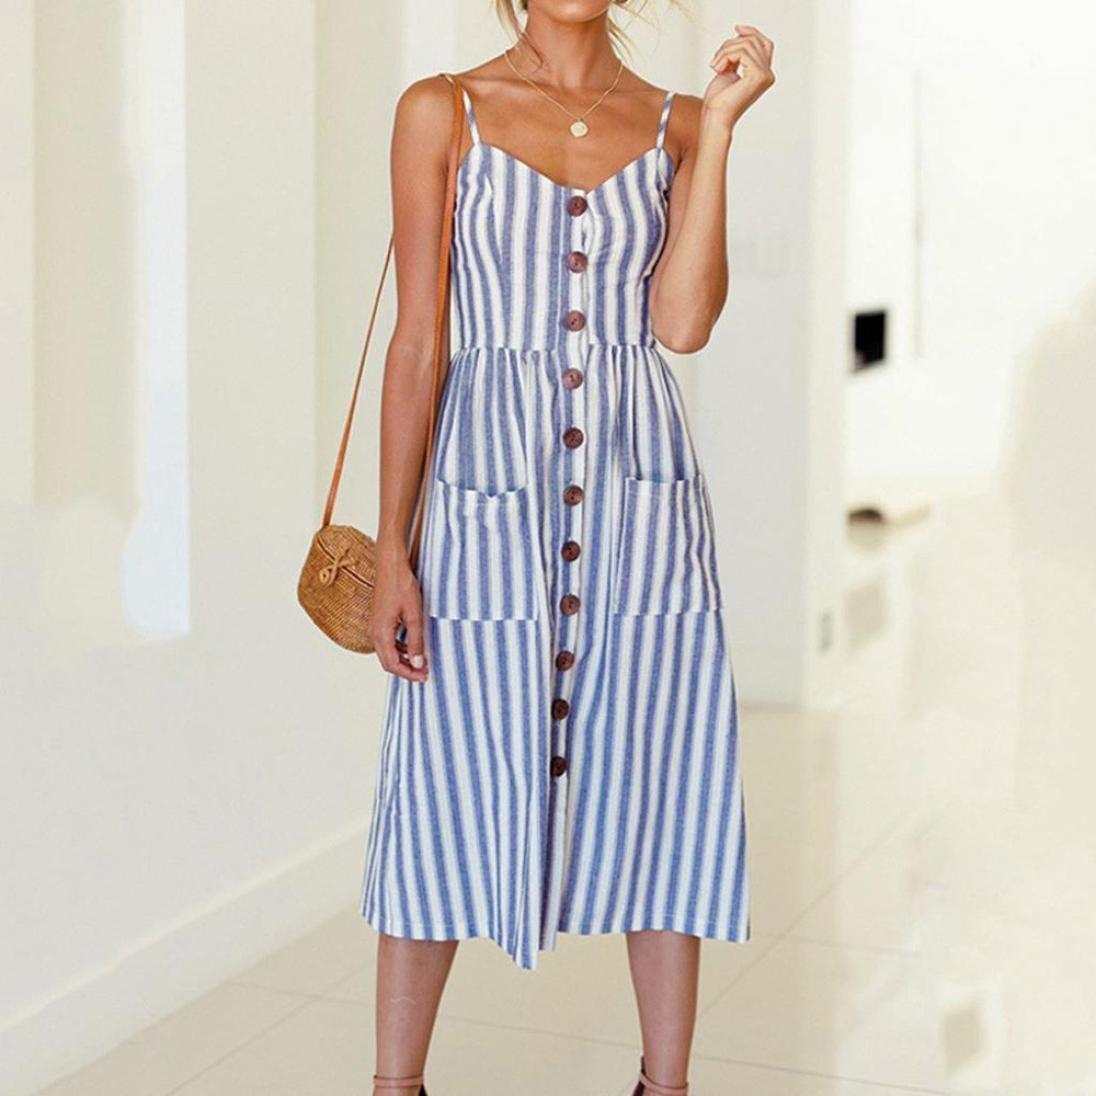 Women S Blue Shift Women Daily Elegant Half Sleeve Paneled Striped Summer Dress Striped Dress Summer Maxi Dress With Sleeves Vertical Striped Dress [ 1024 x 768 Pixel ]